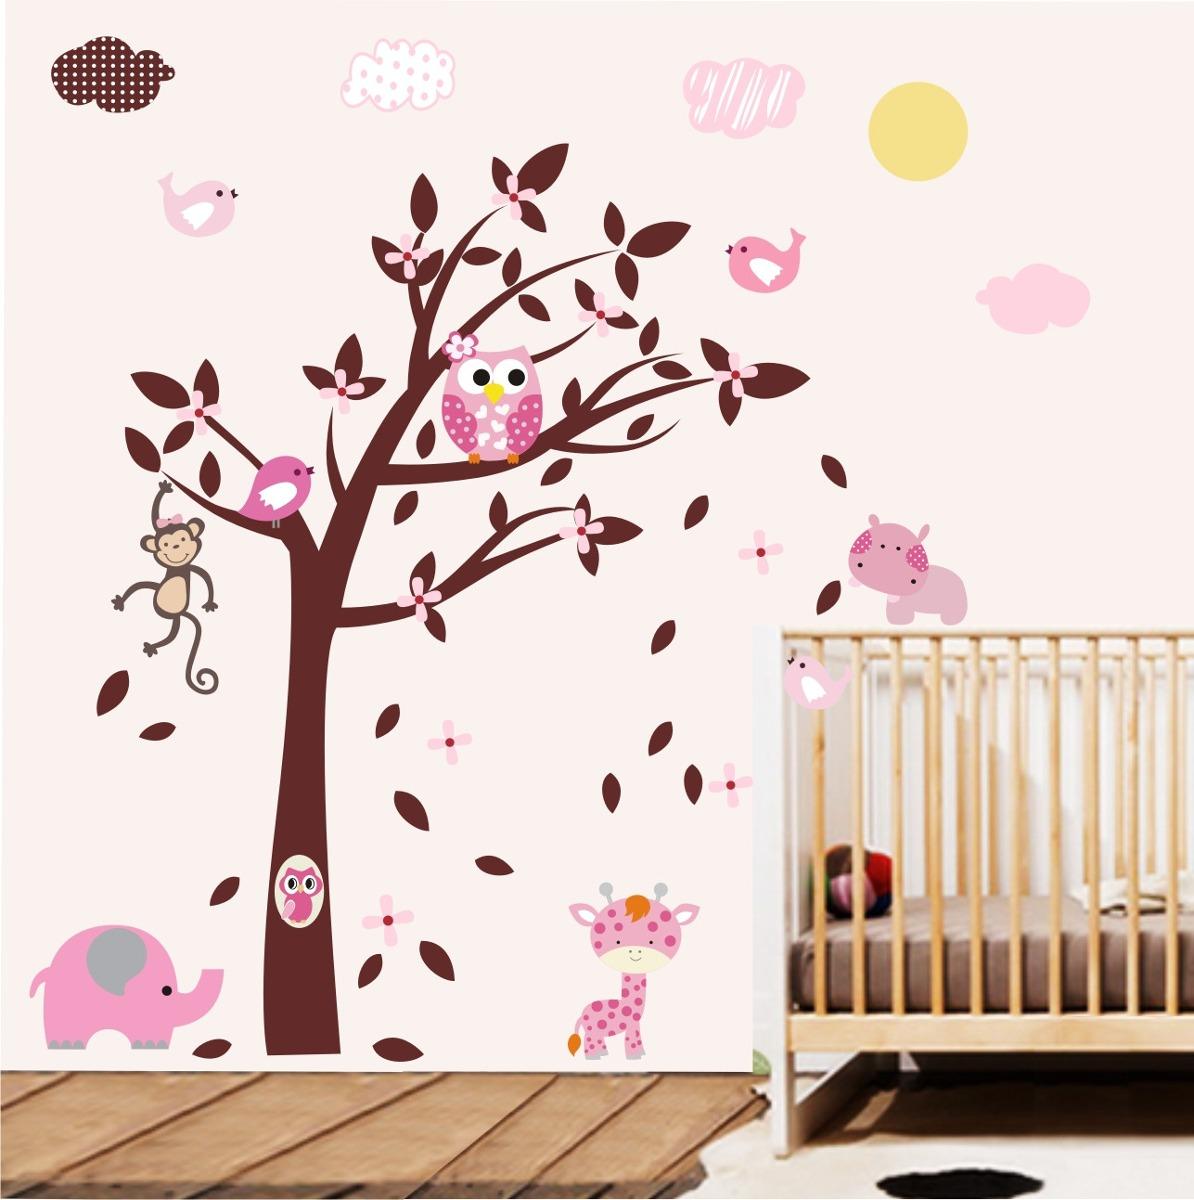 Adesivo papel parede quarto infantil menina safari zoo m97 - Dibujos para paredes infantiles ...